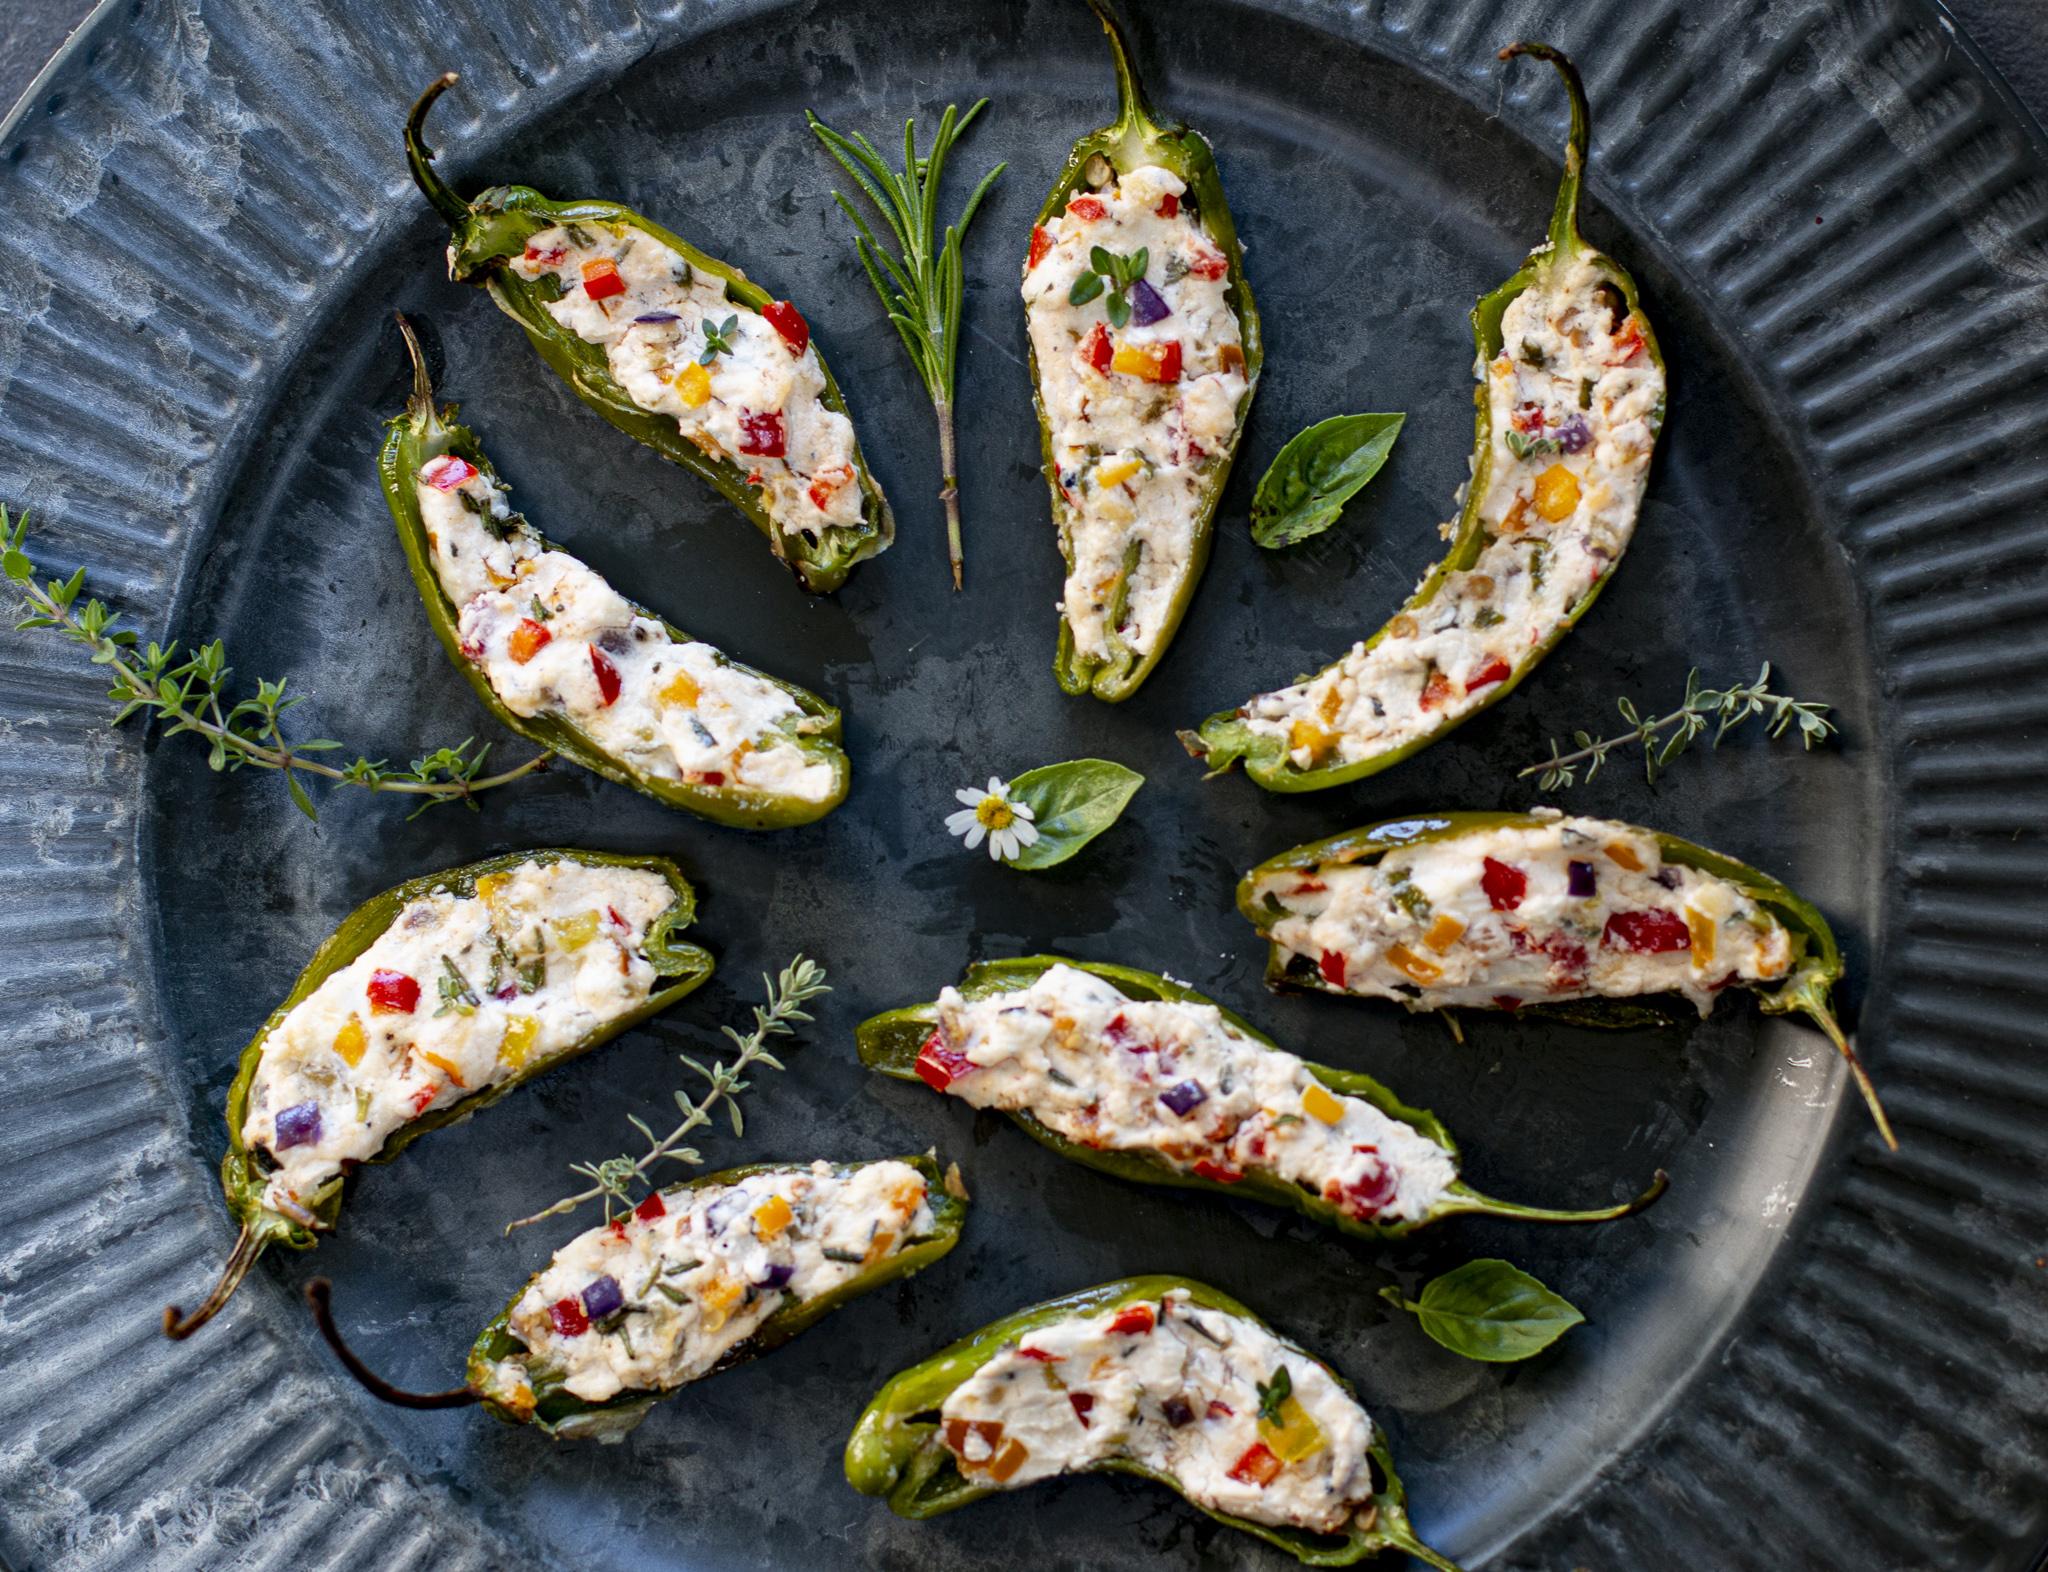 Mediterranean Stuffed Shishito Peppers